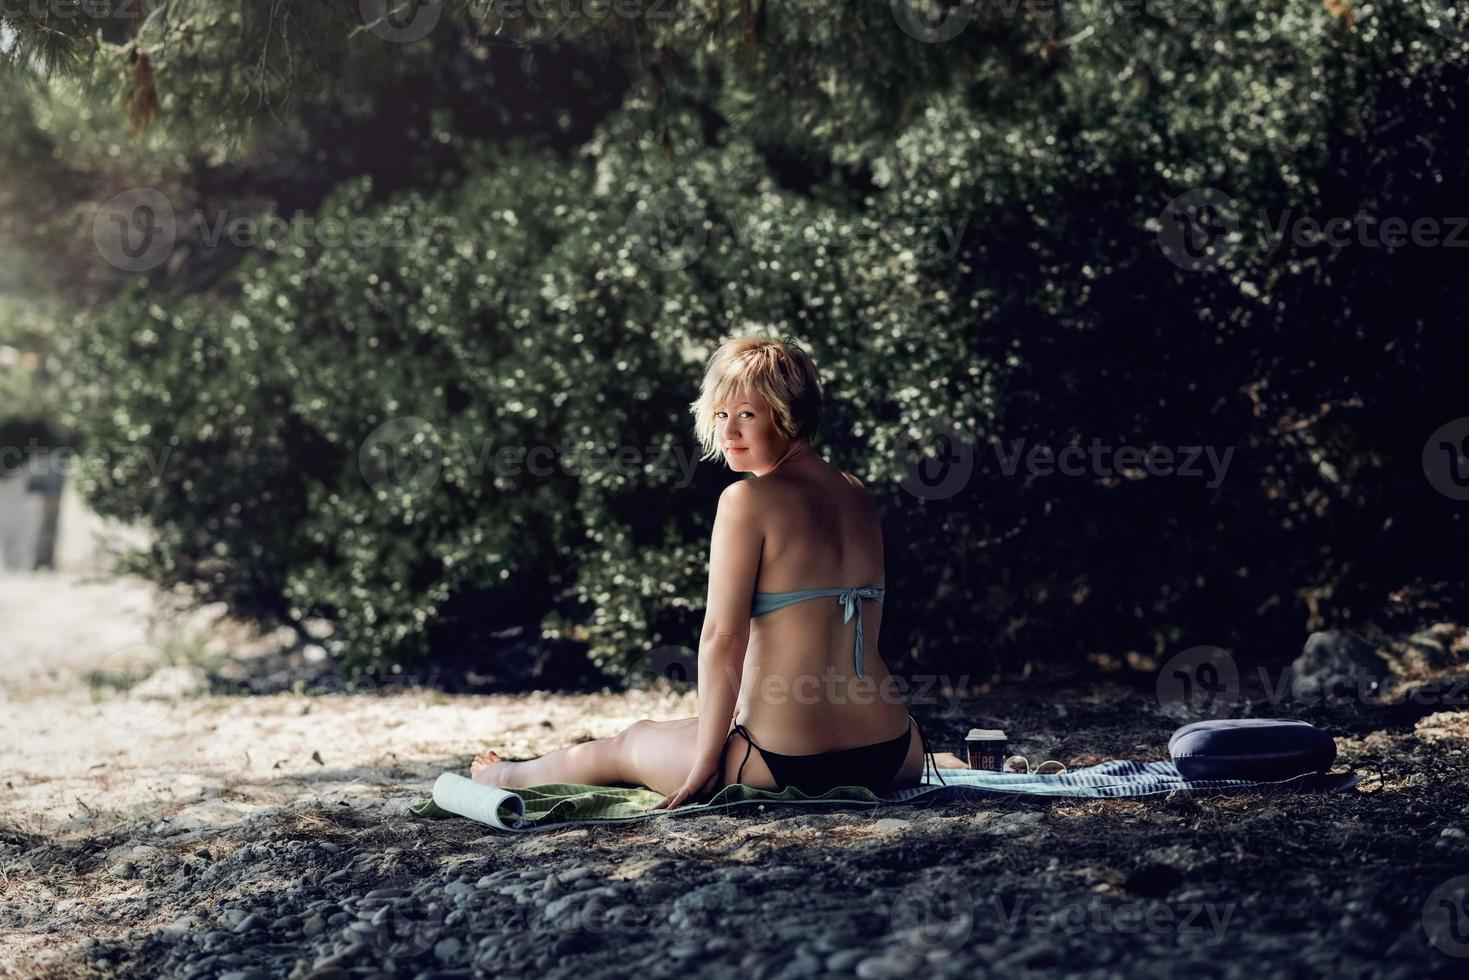 Woman in bikini enjoying alone at the beach. Blonde woman enjoying her coffee in the shade of pine tree at the wild beach. photo